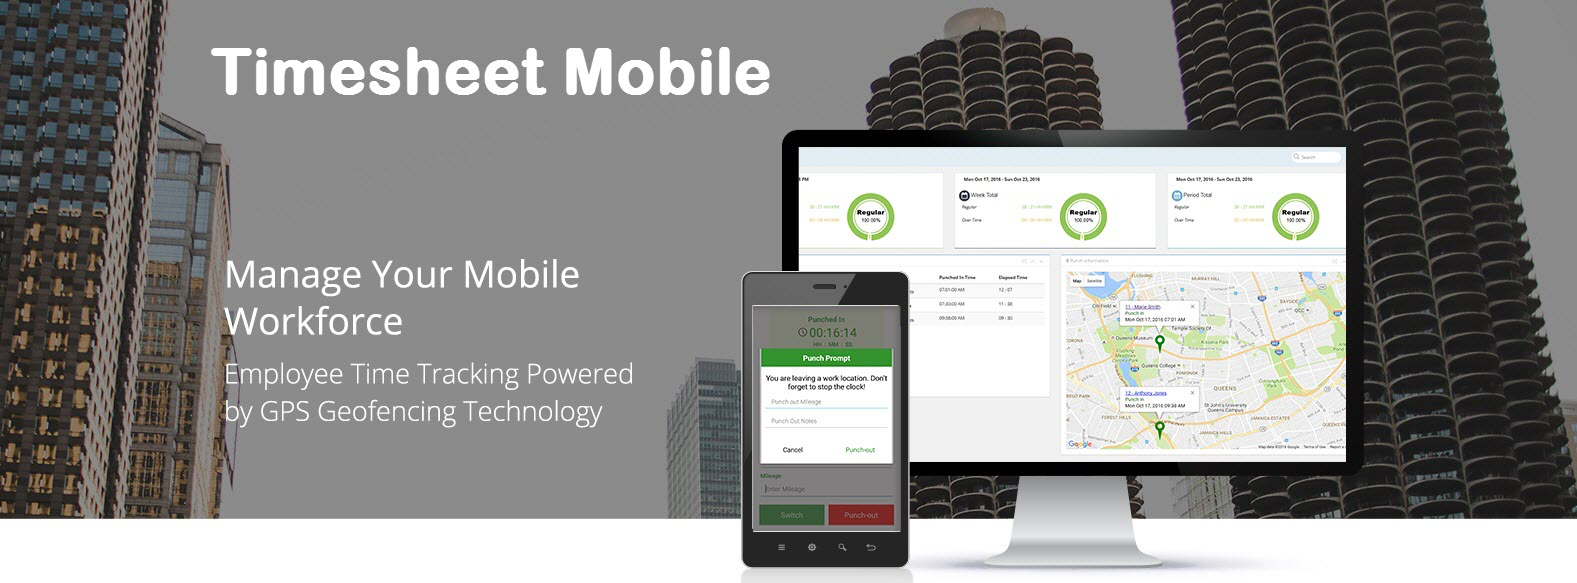 timesheet mobile workforce management app